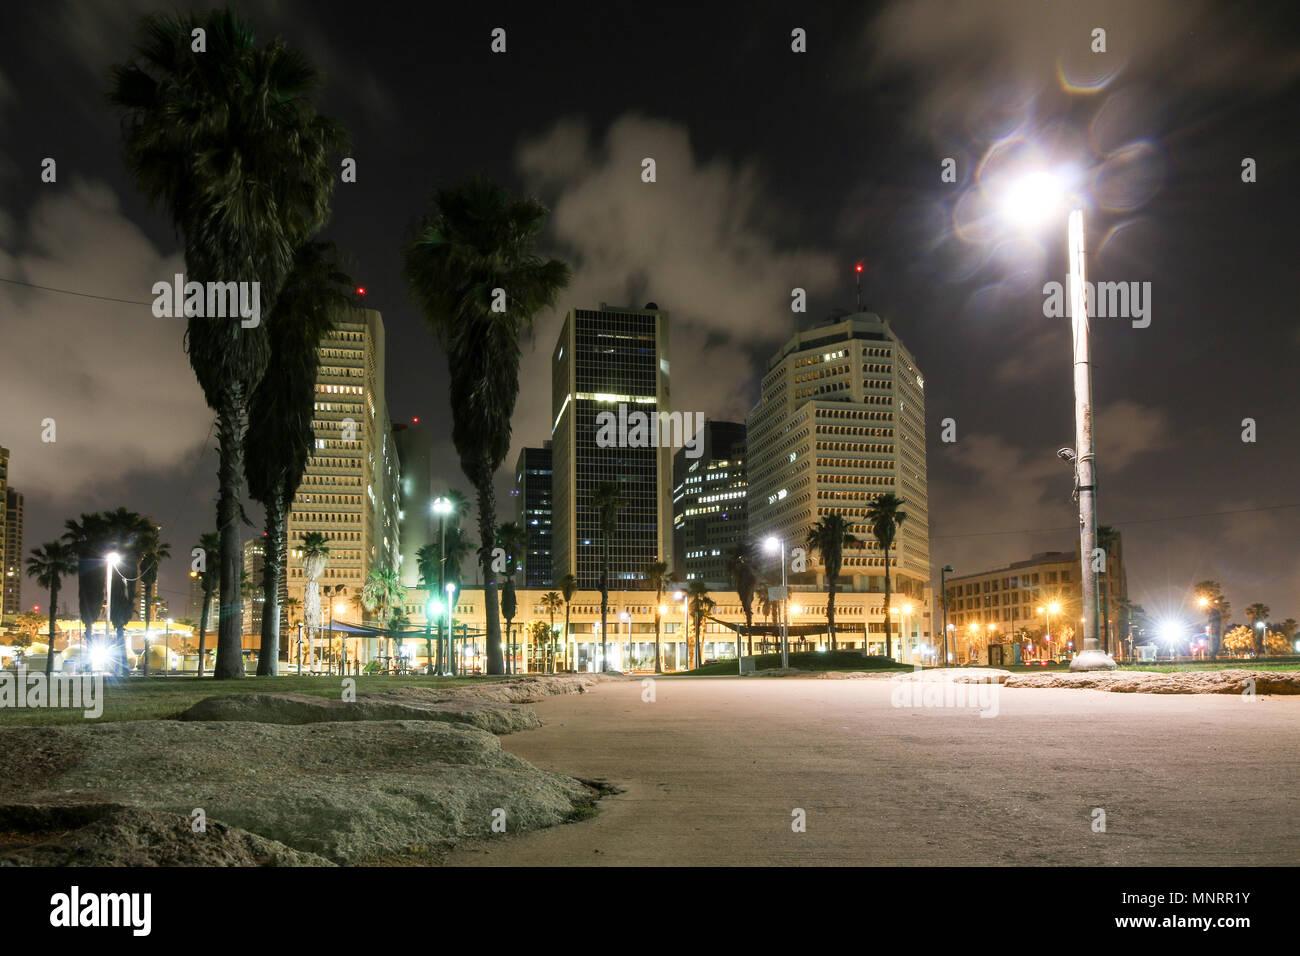 Tel Aviv, Israel - May 12, 2018: View of hotels on the beach of the coastal metropolis Tel Aviv at night, Israel. - Stock Image